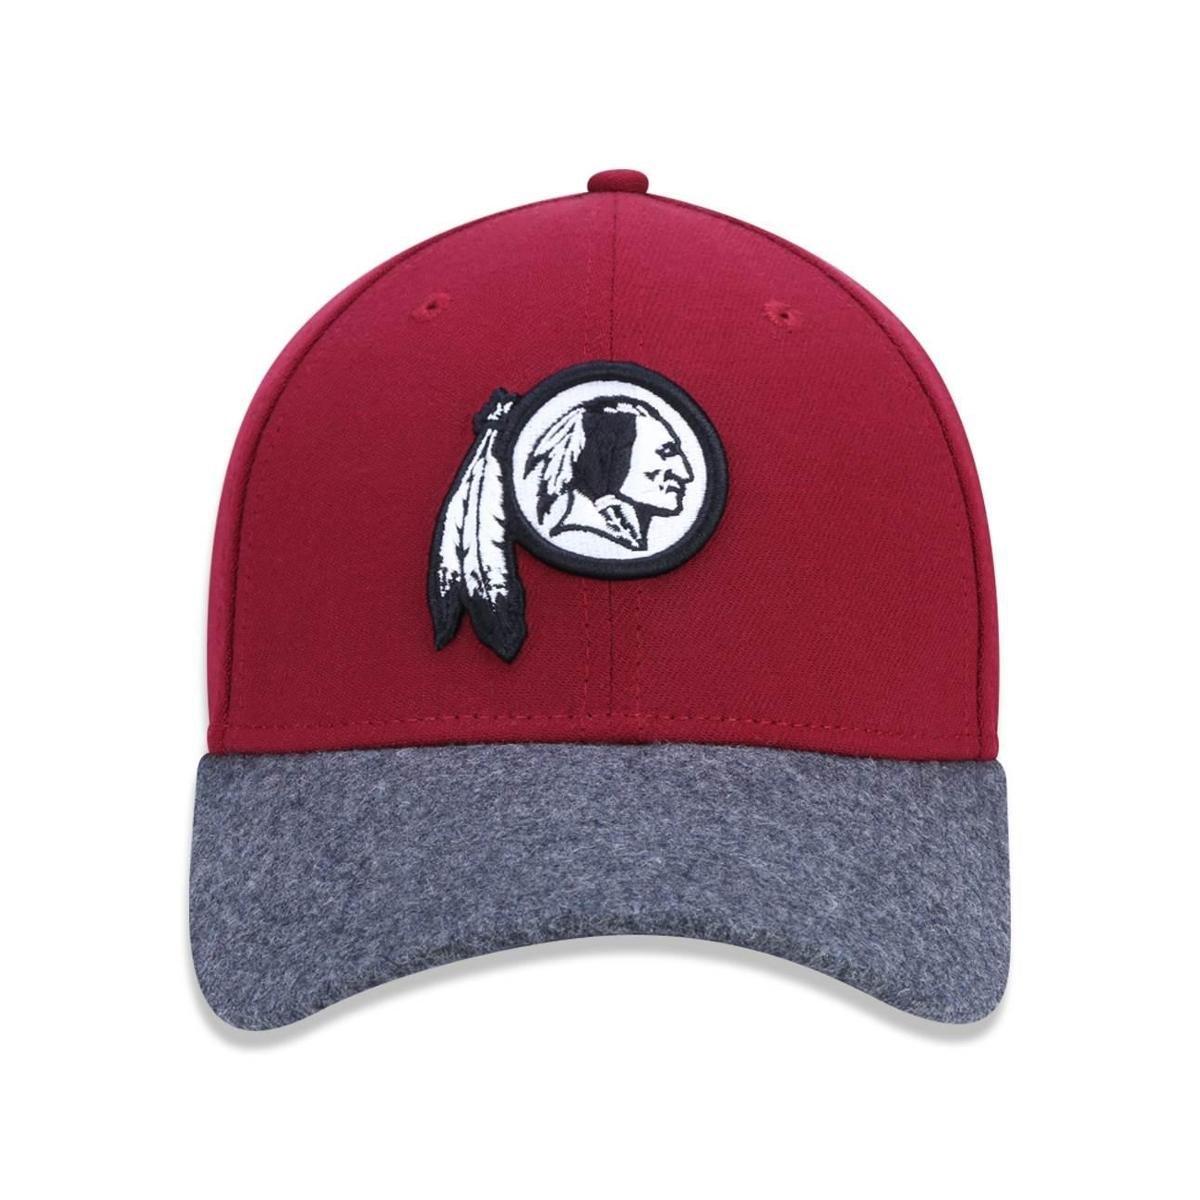 Bone 3930 Washington Redskins NFL New Era - Vermelho Escuro e Chumbo ... 577461b1866